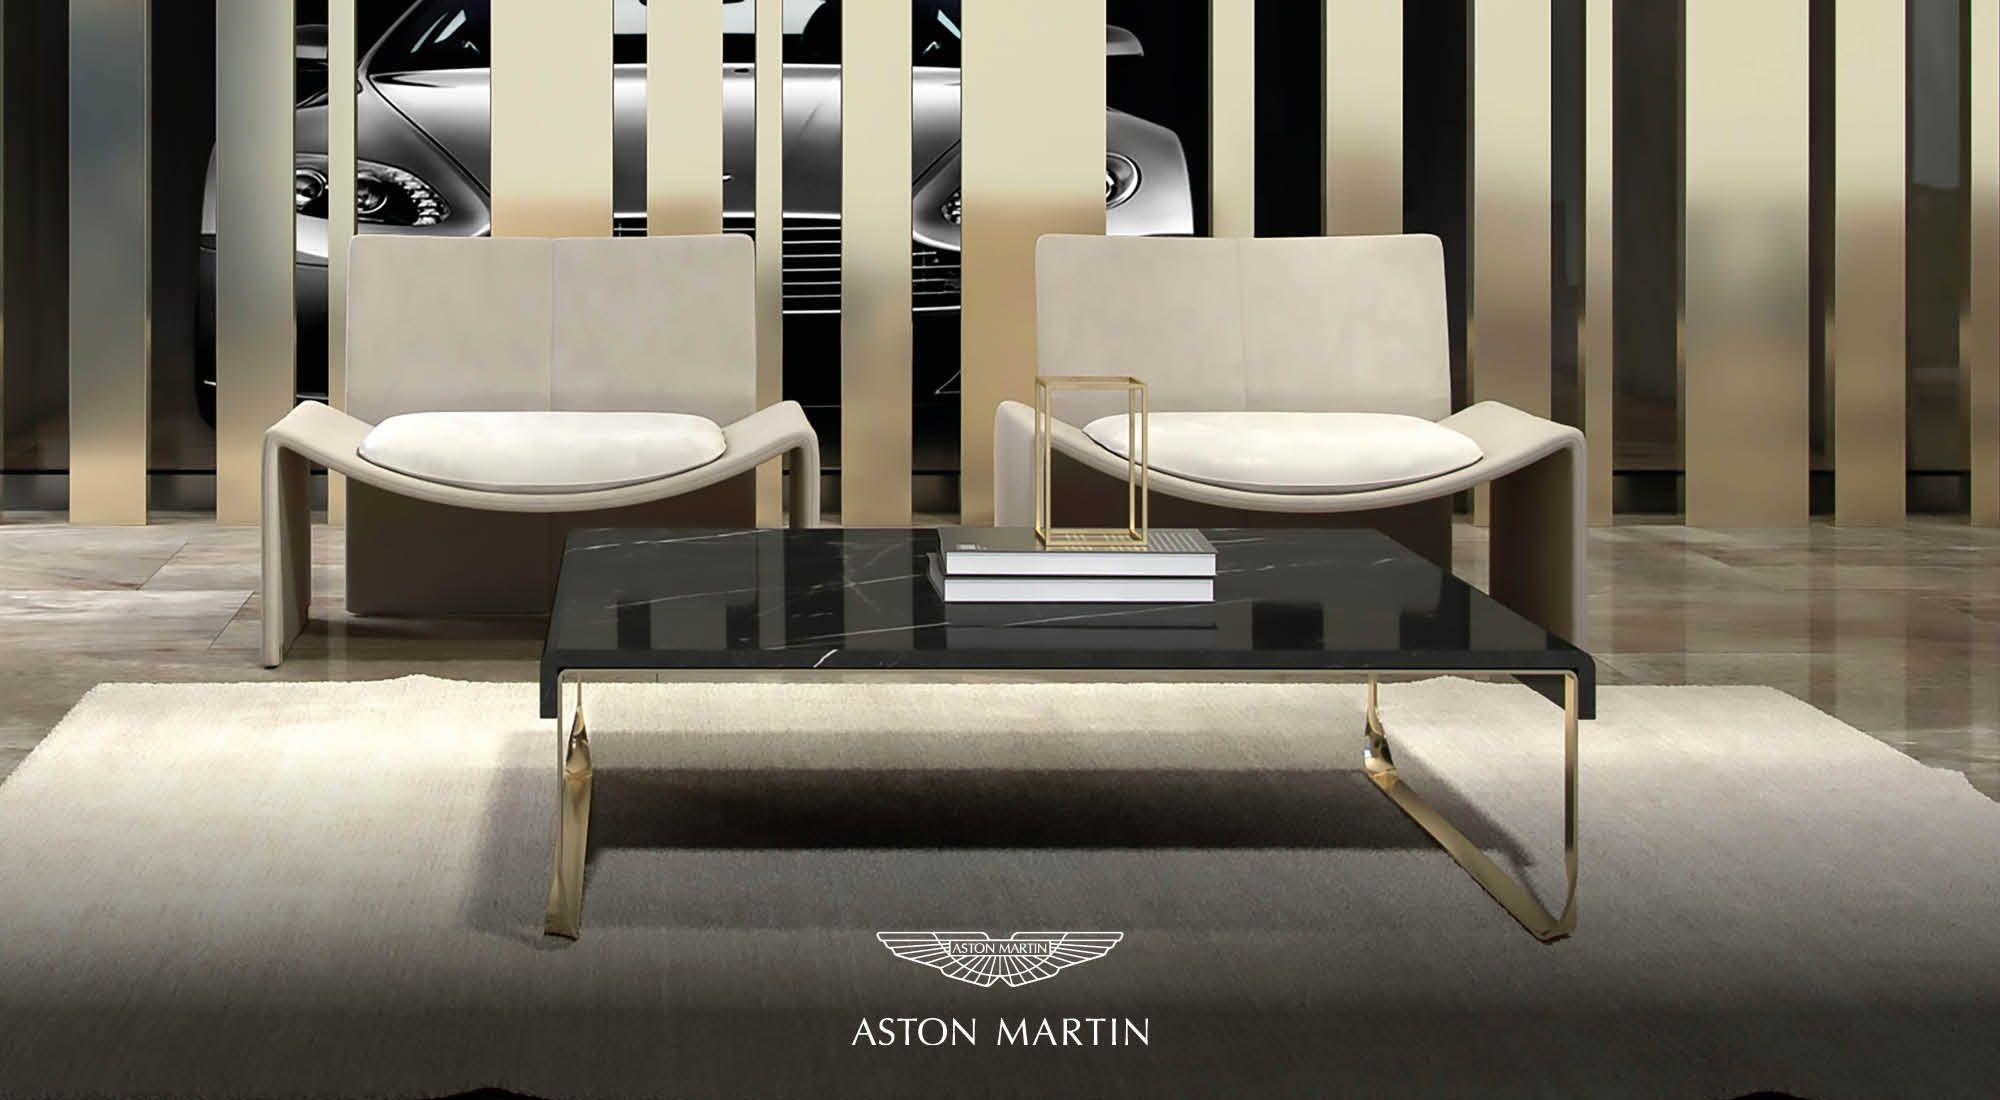 Aston Martin Formitalia Luxury Group Martin Furniture Furniture Interior